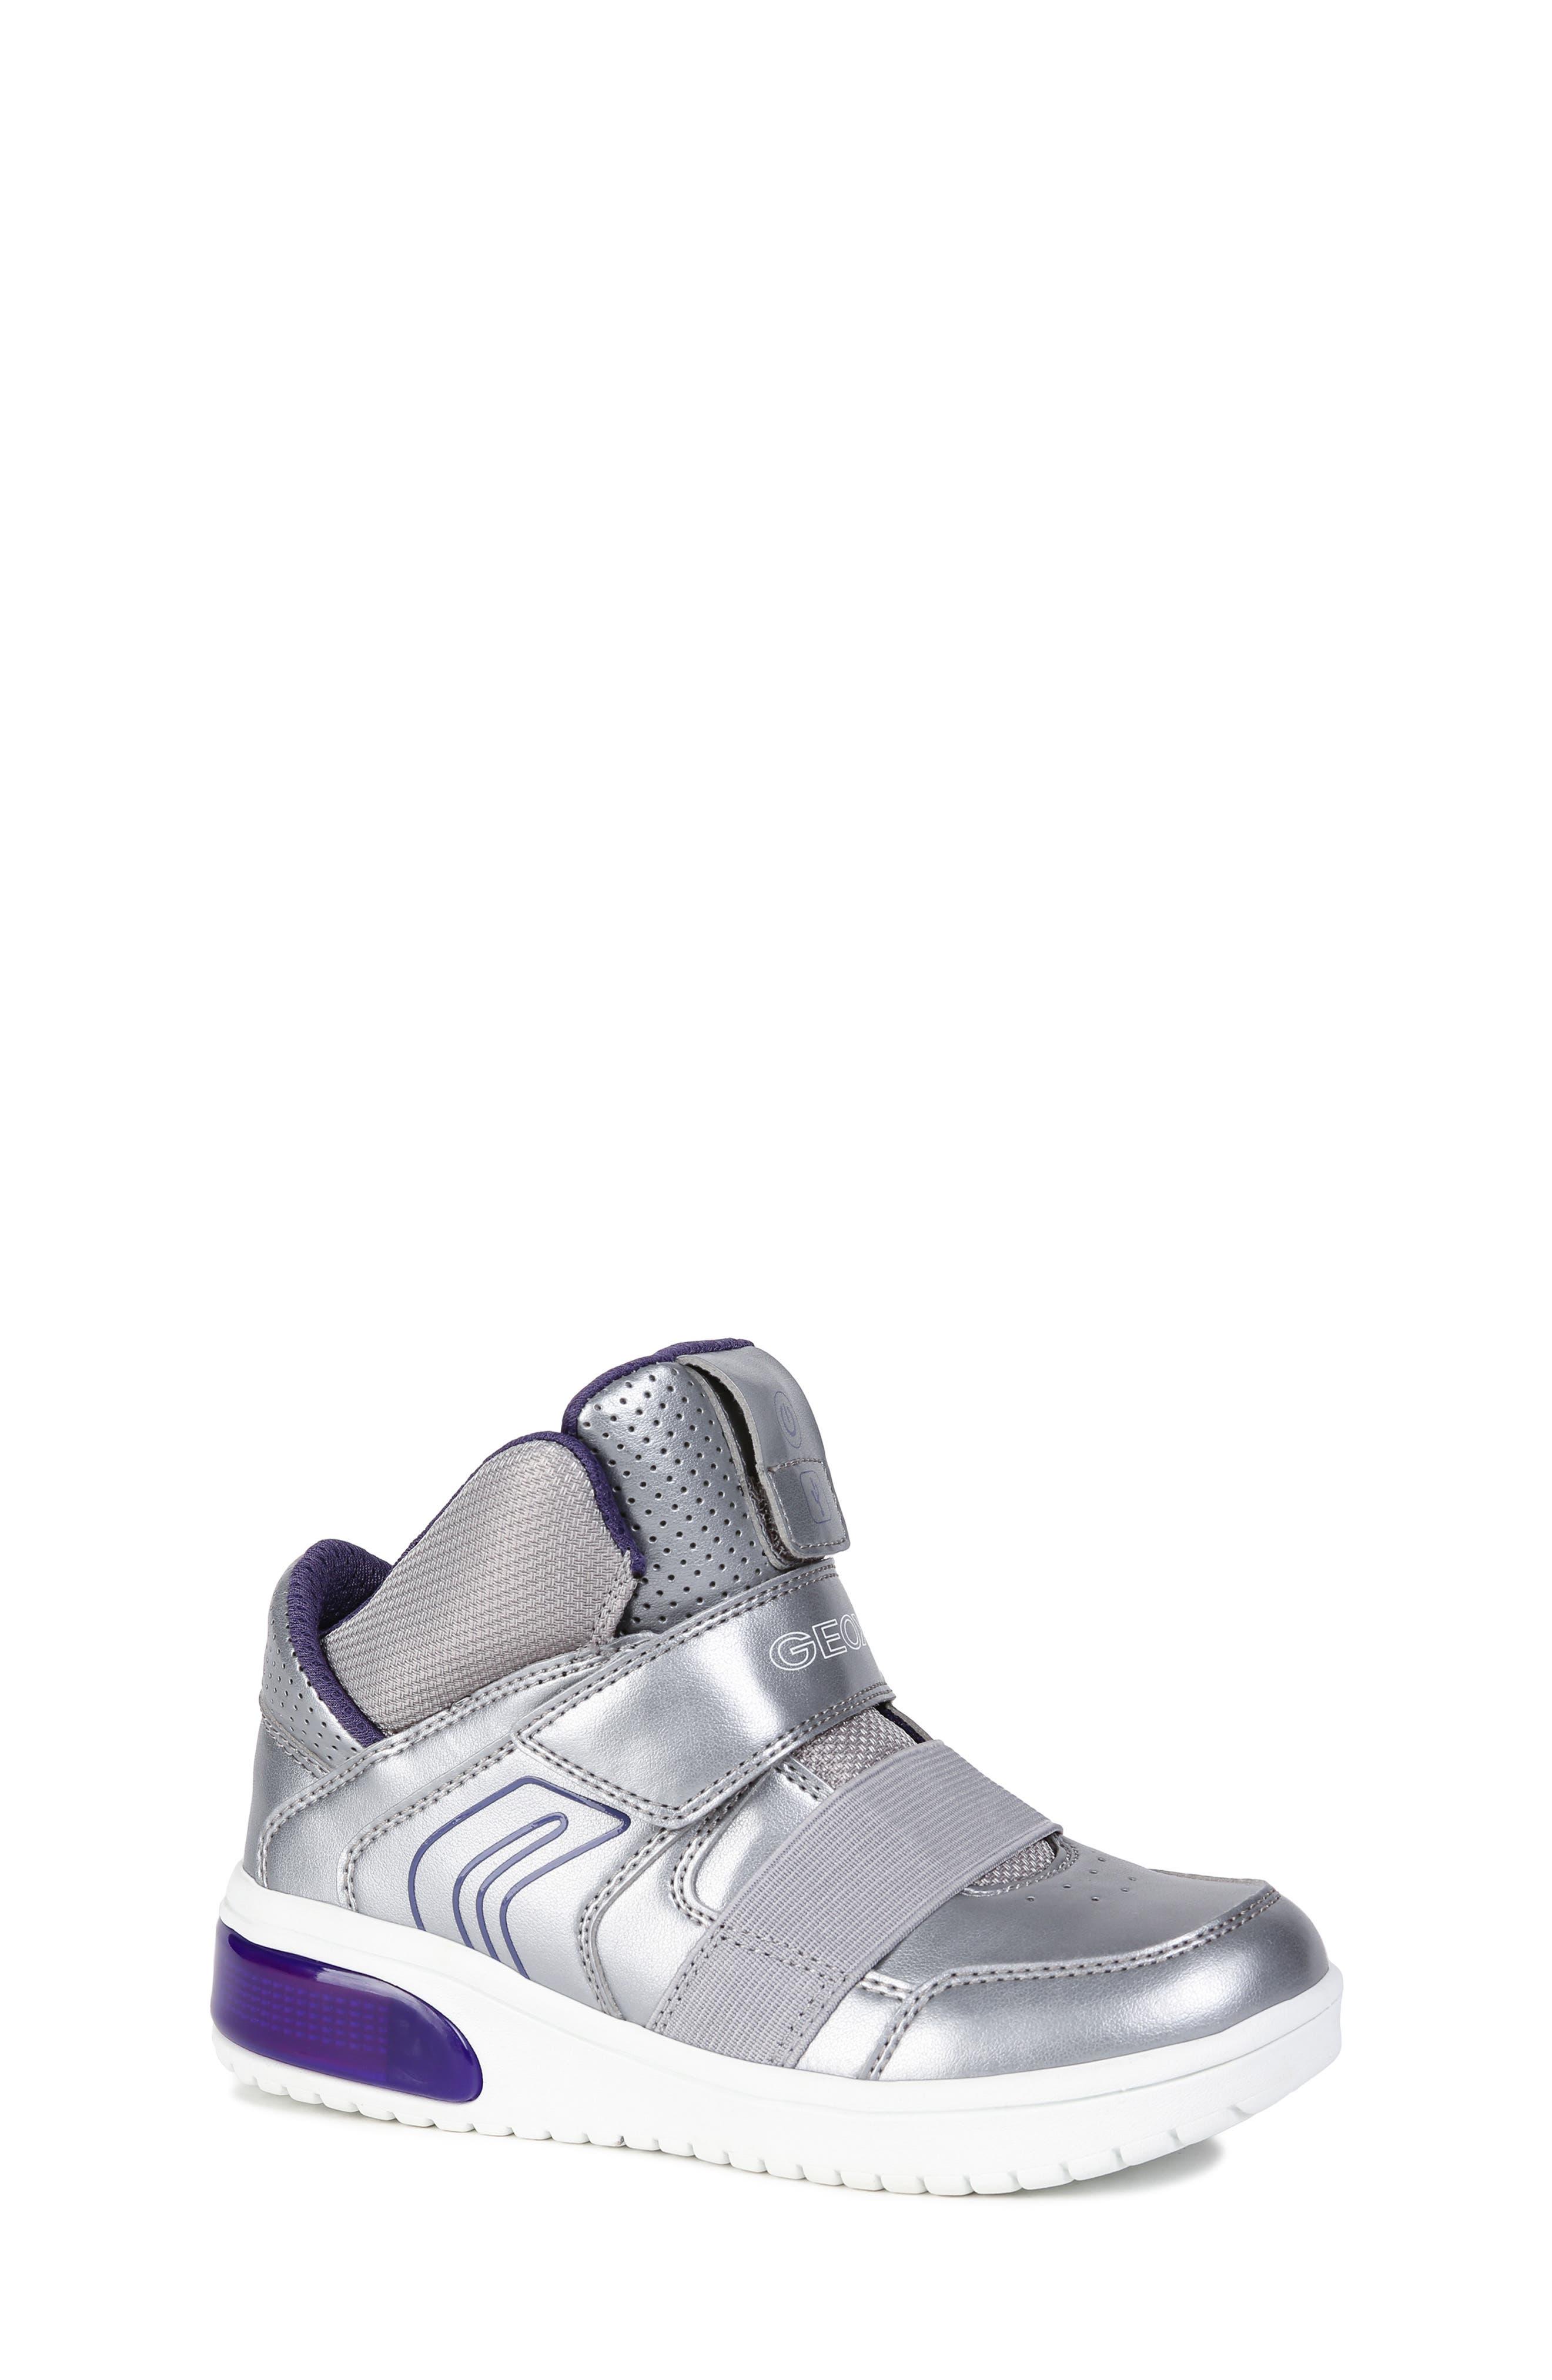 Xled Light Up Sneaker,                         Main,                         color, SILVER/ VIOLET